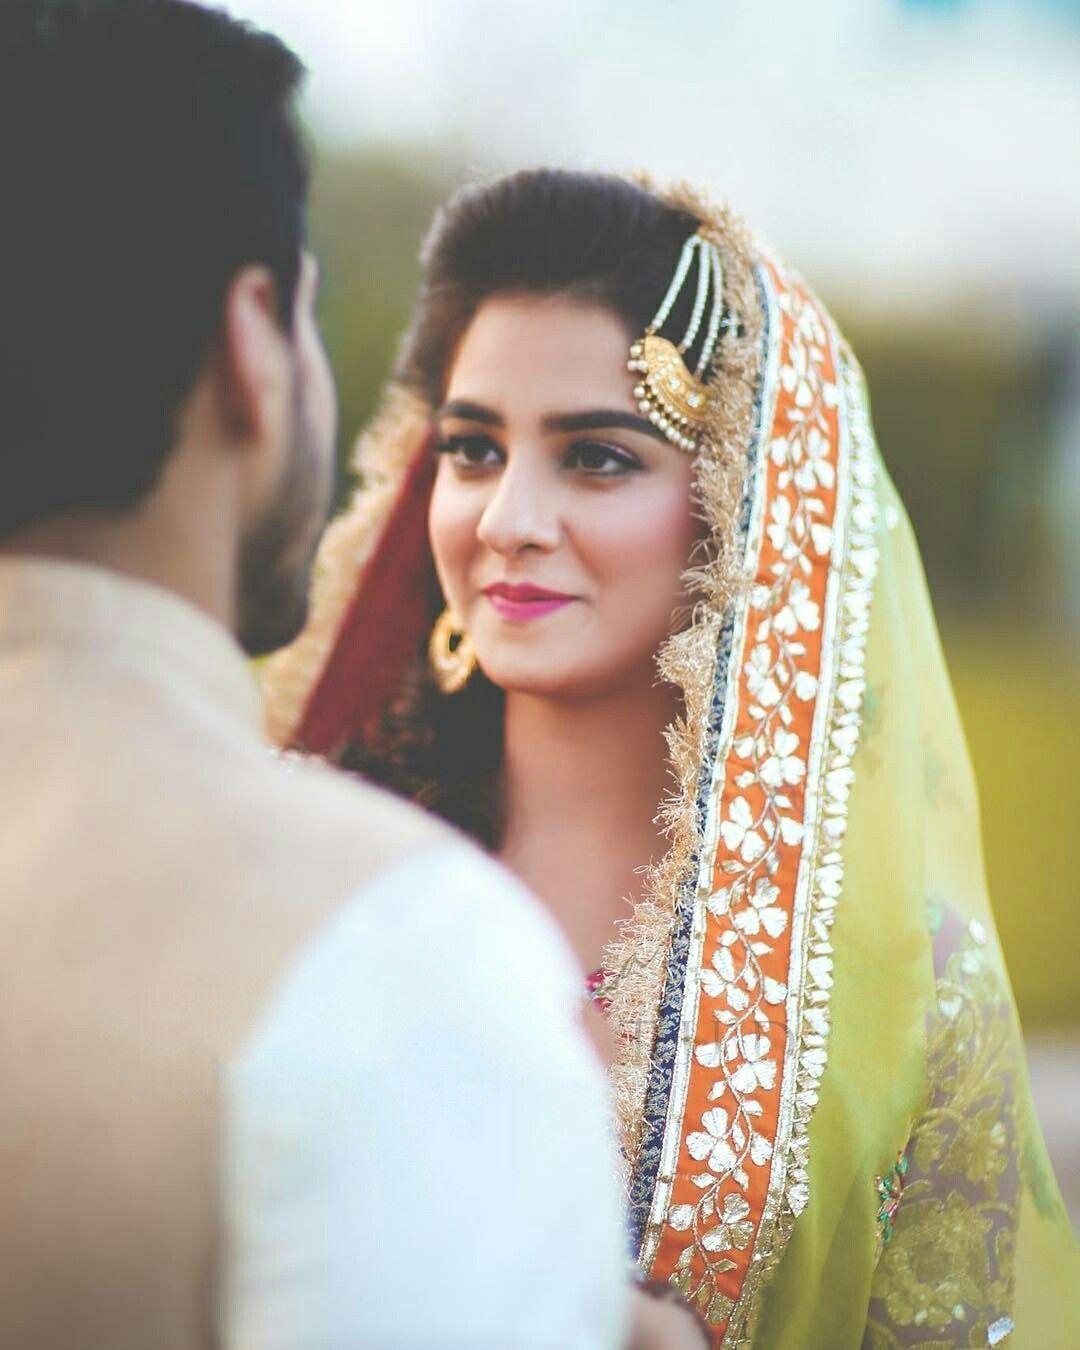 Marriage Bureau - Makemylagan.com - Matrimonial Services in Delhi, Ncr & for Nri for All Communities